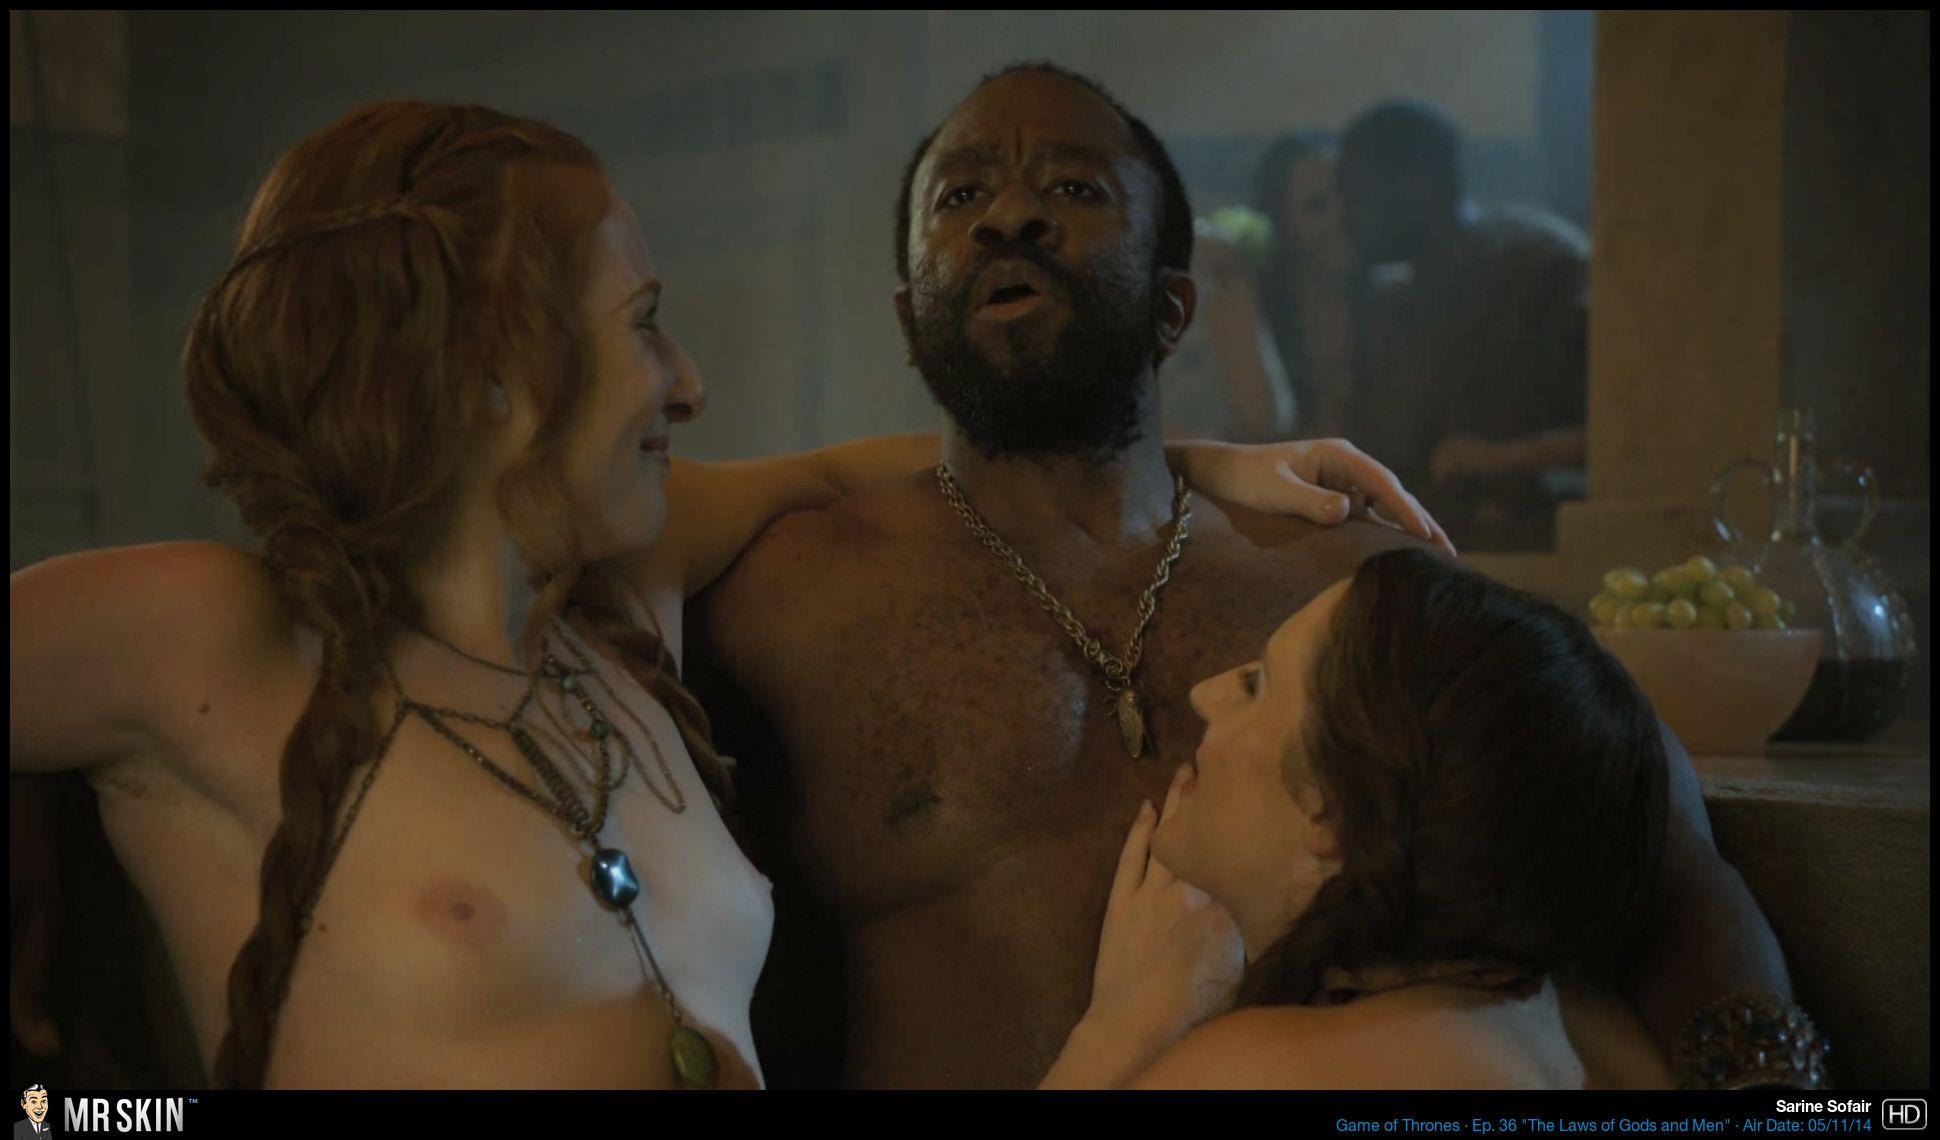 Desnudo desnudo juego